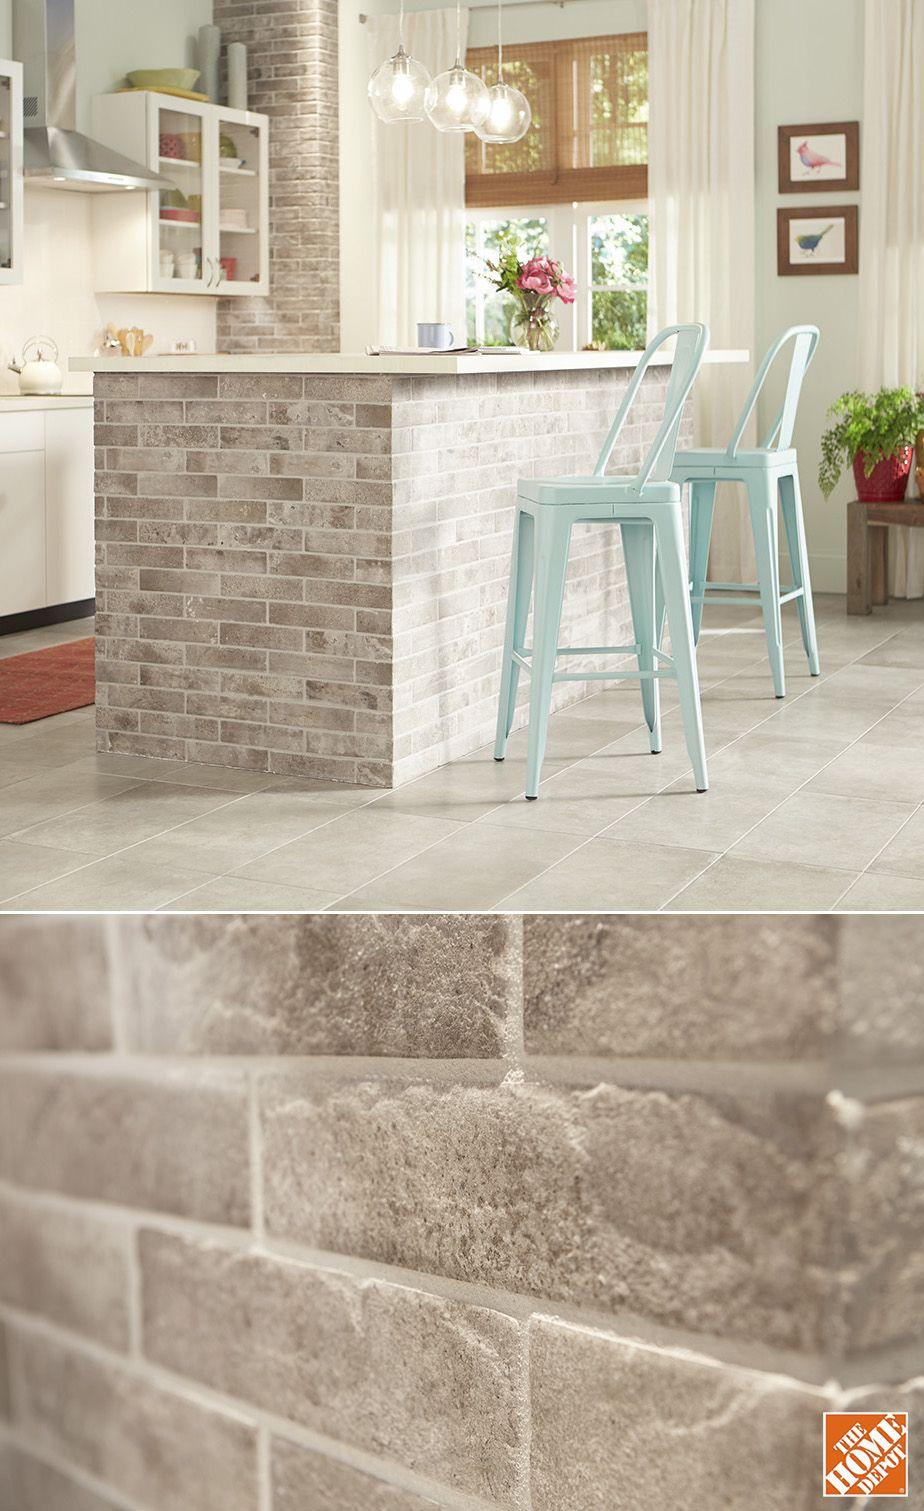 Ms international abbey brick 2 1 3 in x 10 in glazed porcelain floor and wall tile sq - Backsplash that looks like brick ...